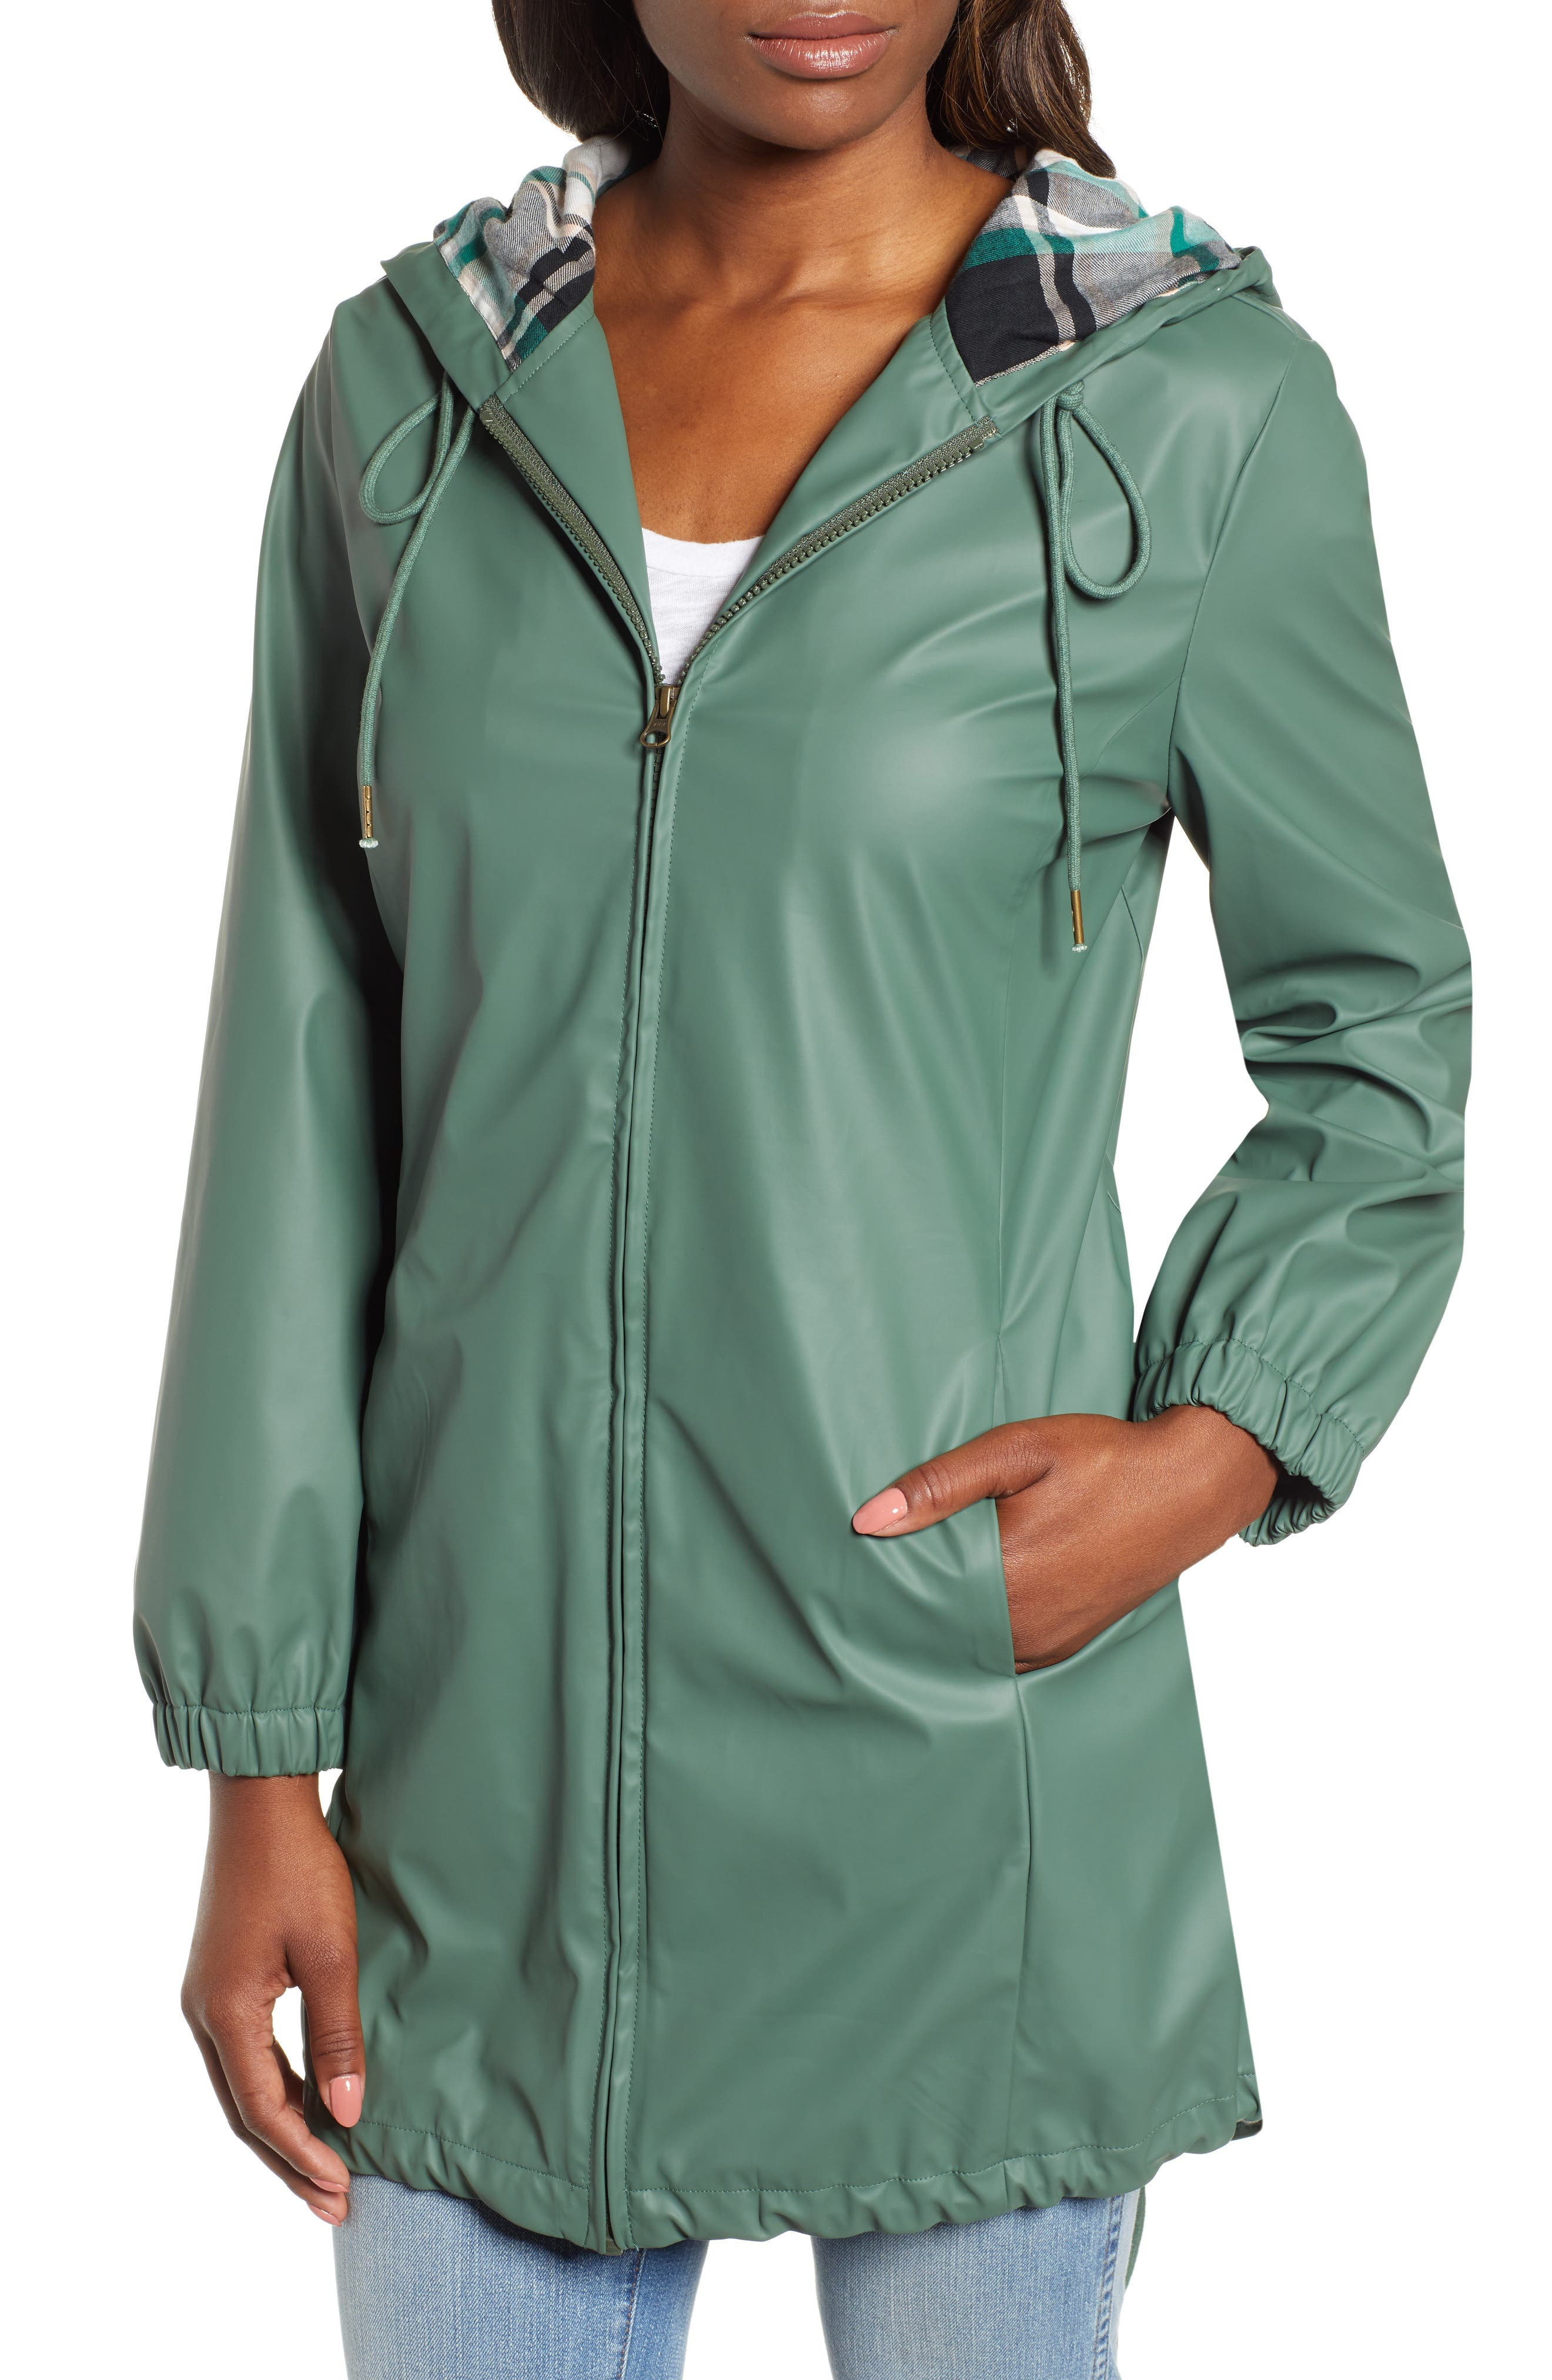 Hooded Rain Jacket,                             Alternate thumbnail 4, color,                             310